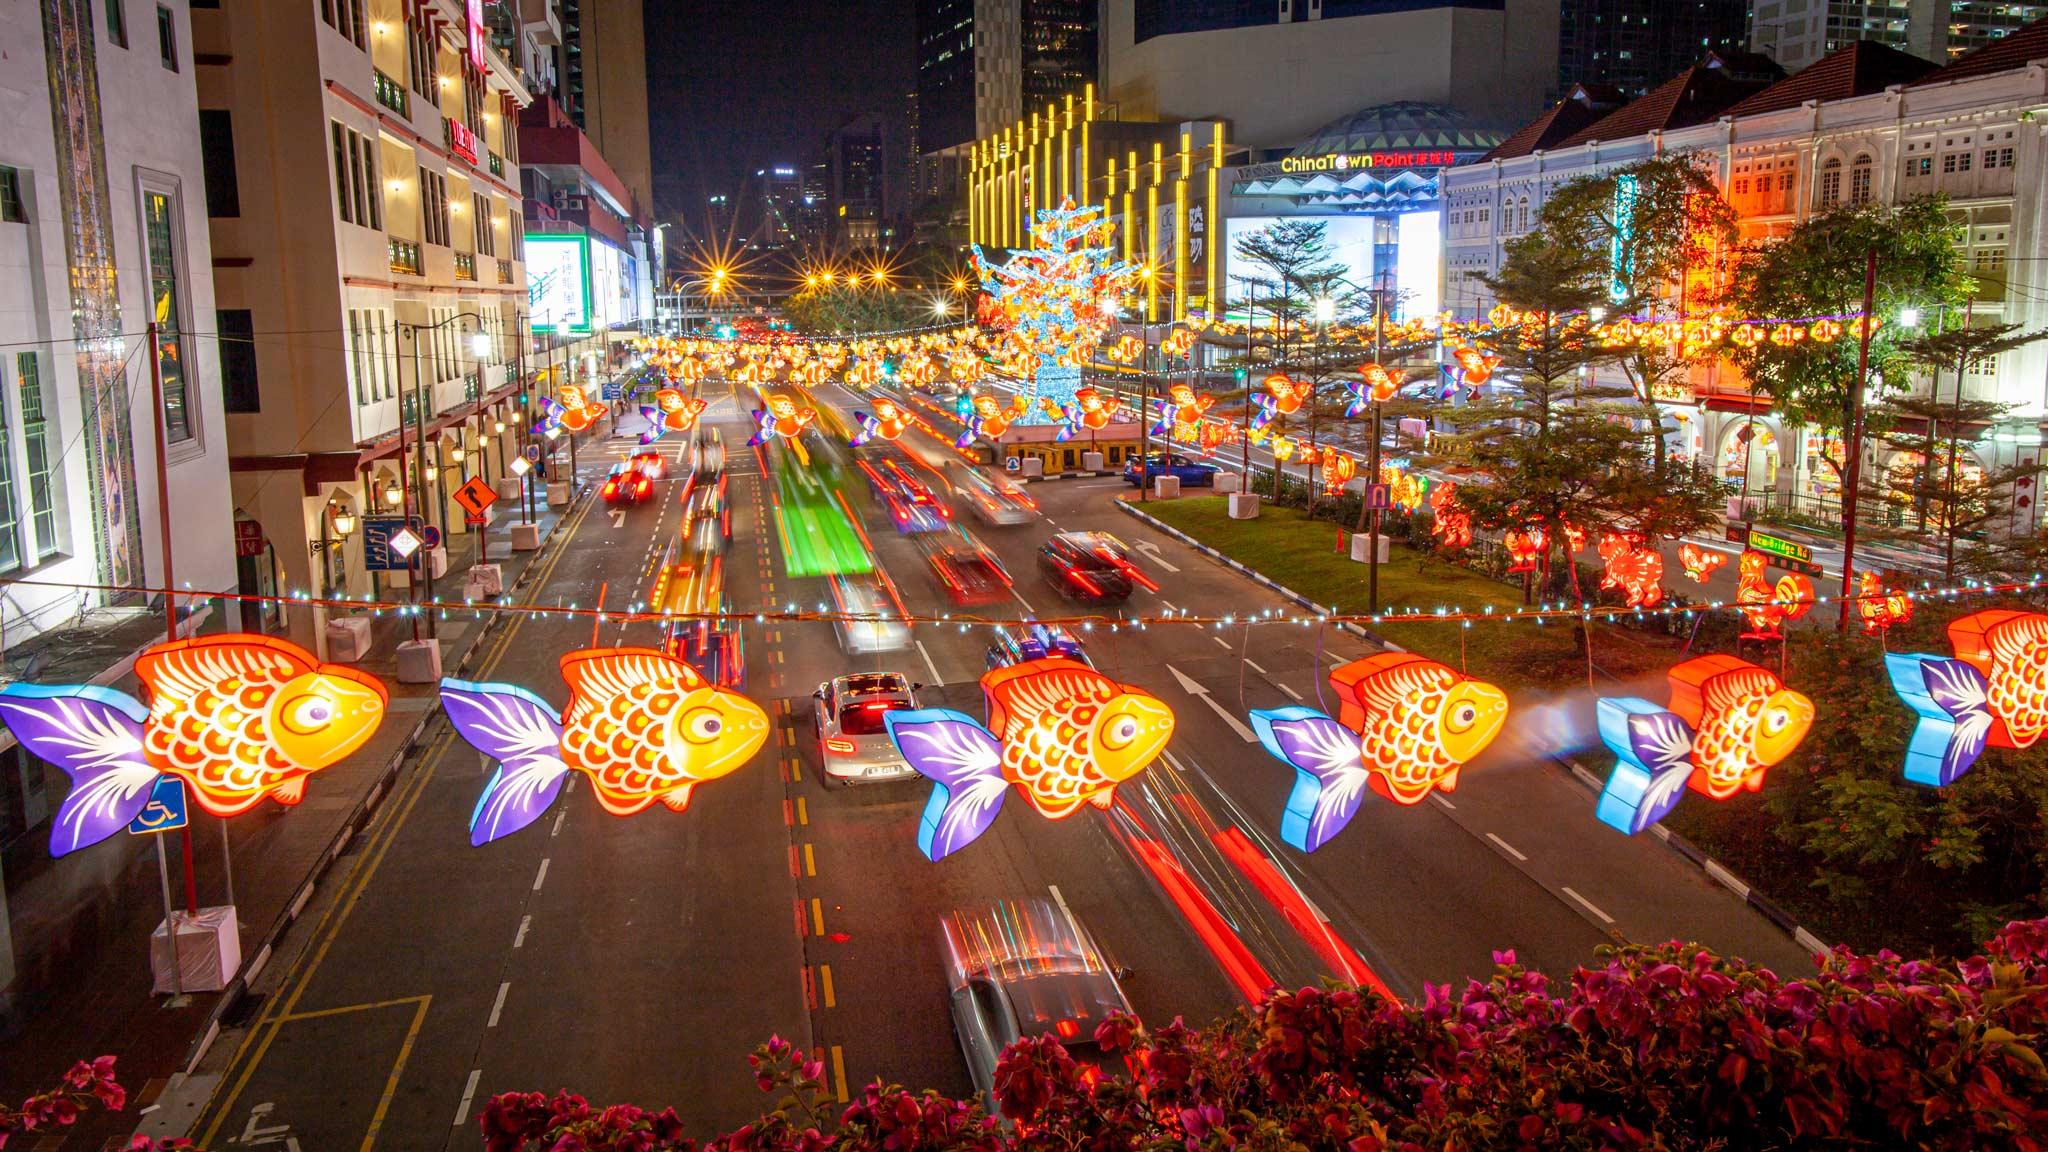 Colourful illuminated Chinese fish in Chinatown